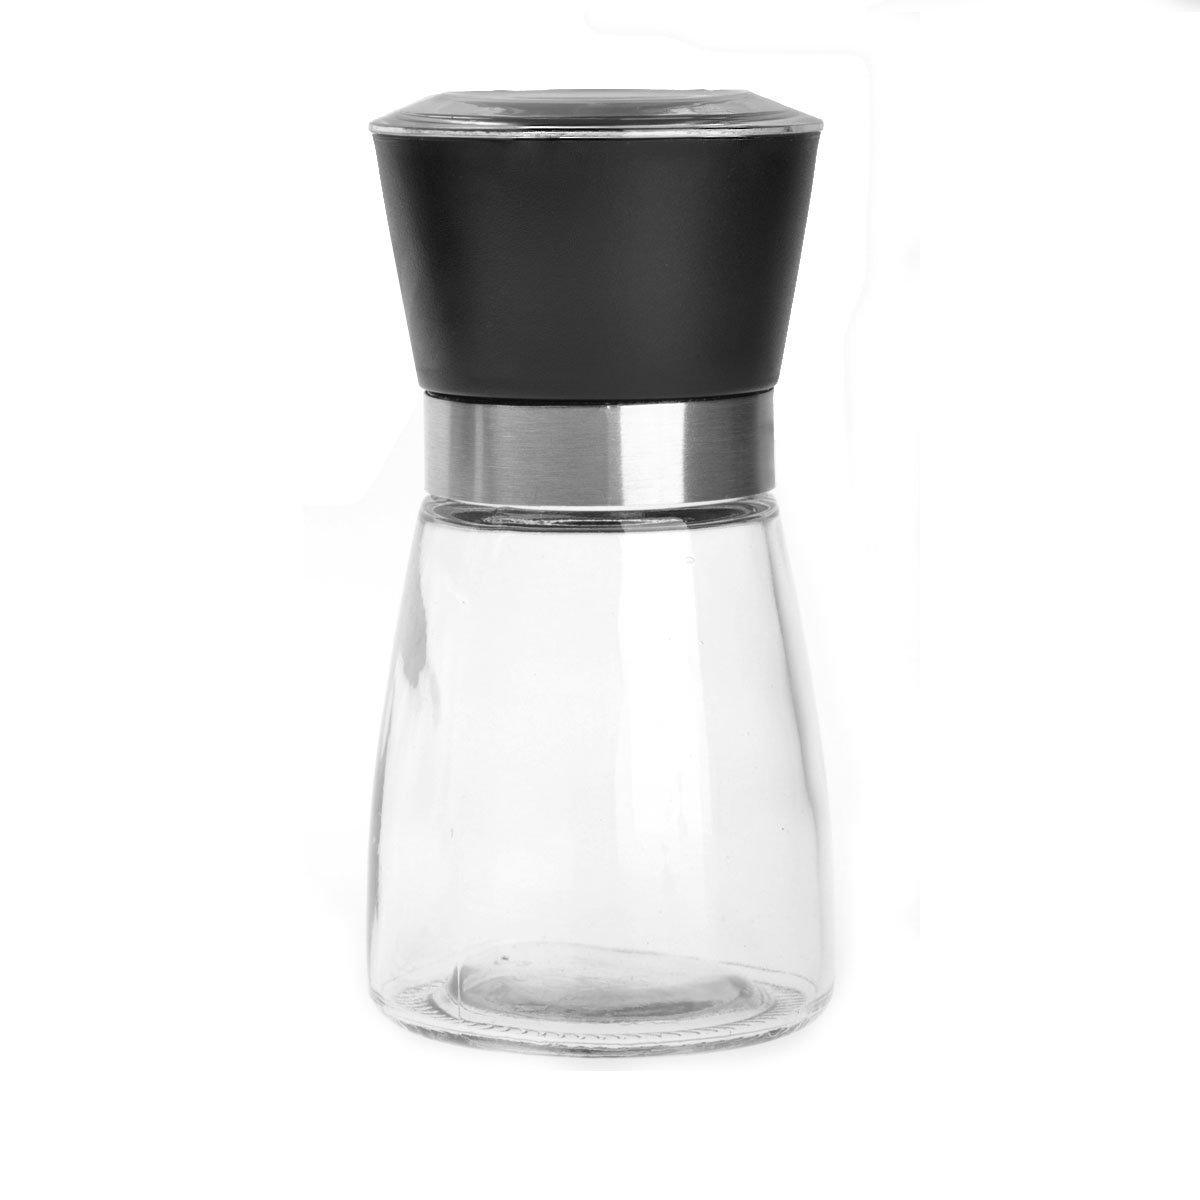 OnePlus High Grips Glass Salt or Pepper Grinder